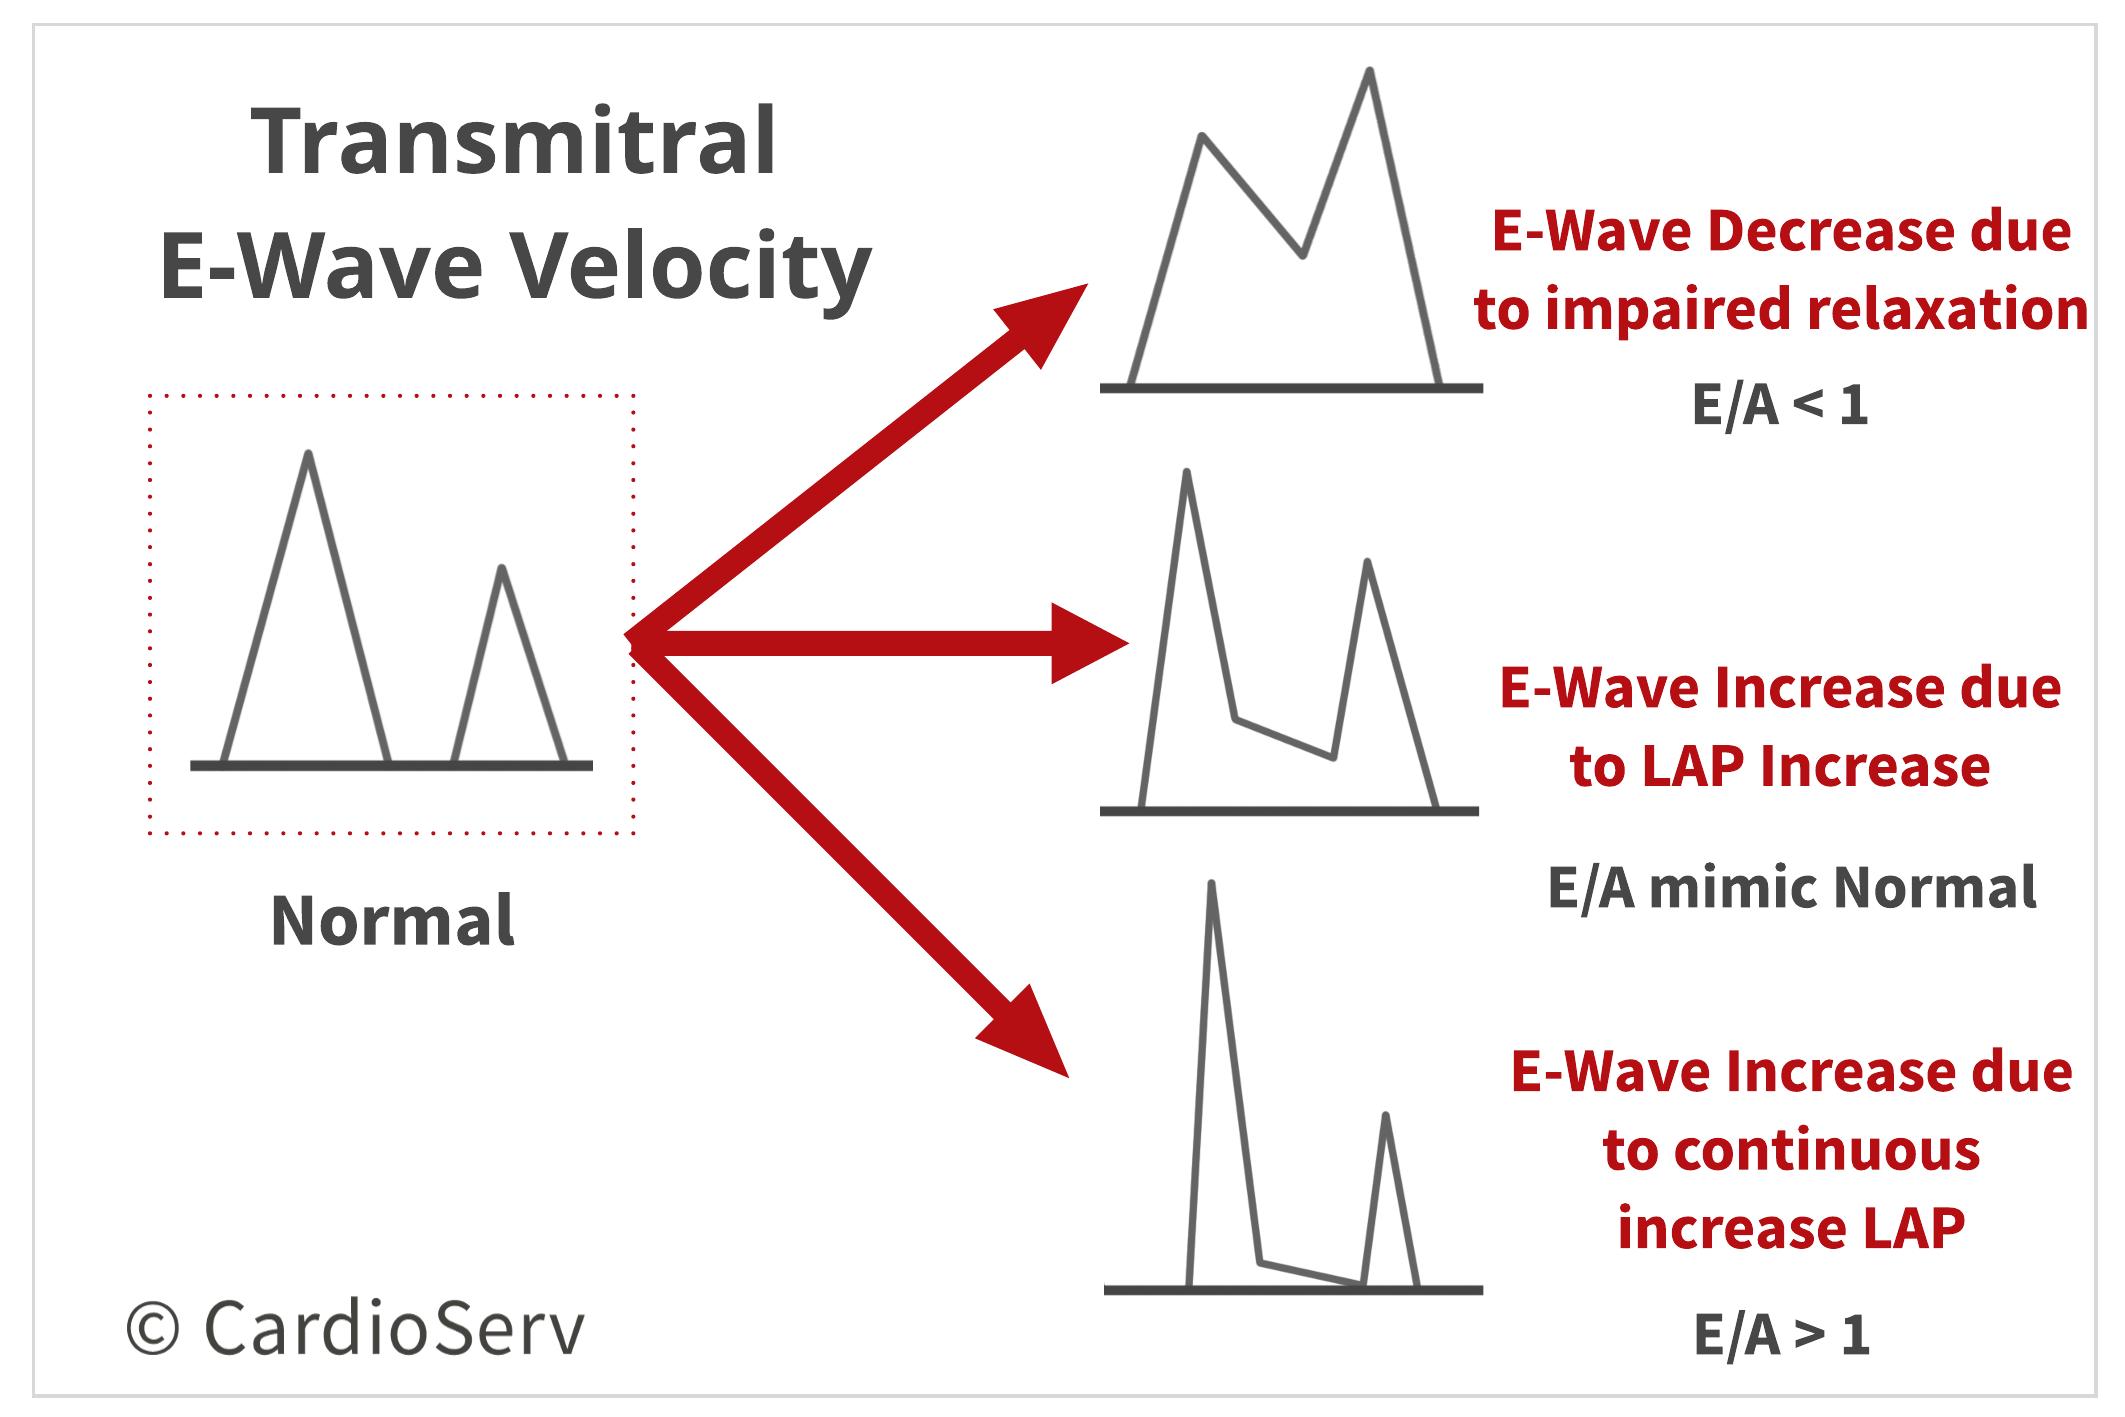 Transmitral E-Wave Velocity